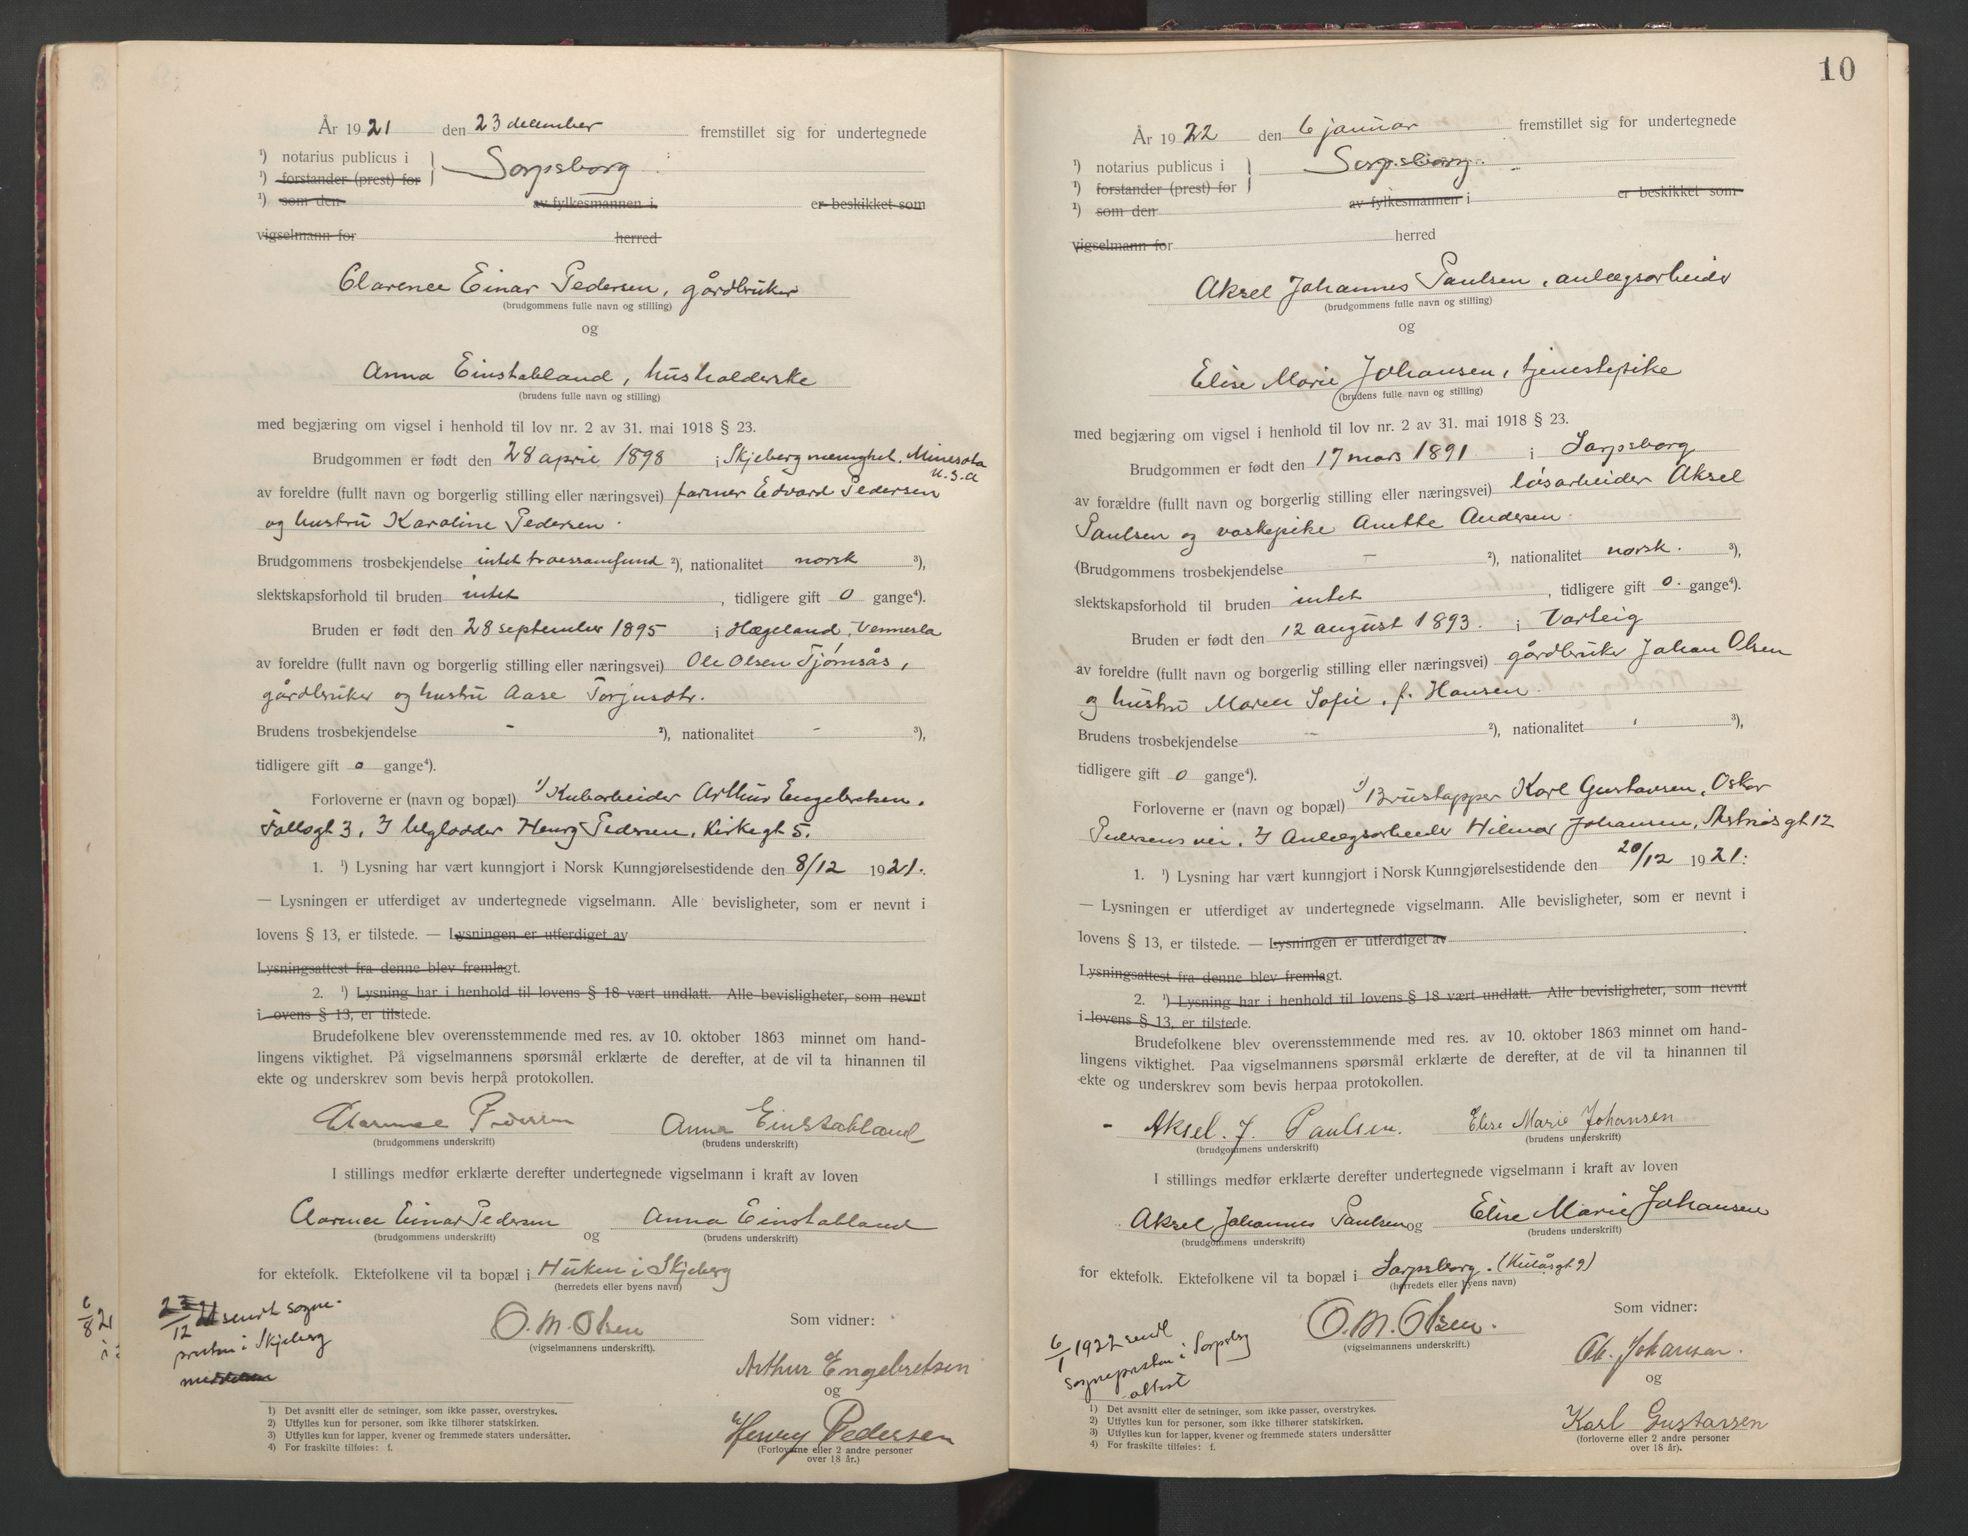 SAO, Sarpsborg byfogd, L/Lb/Lba/L0001: Vigselbok, 1920-1941, s. 10